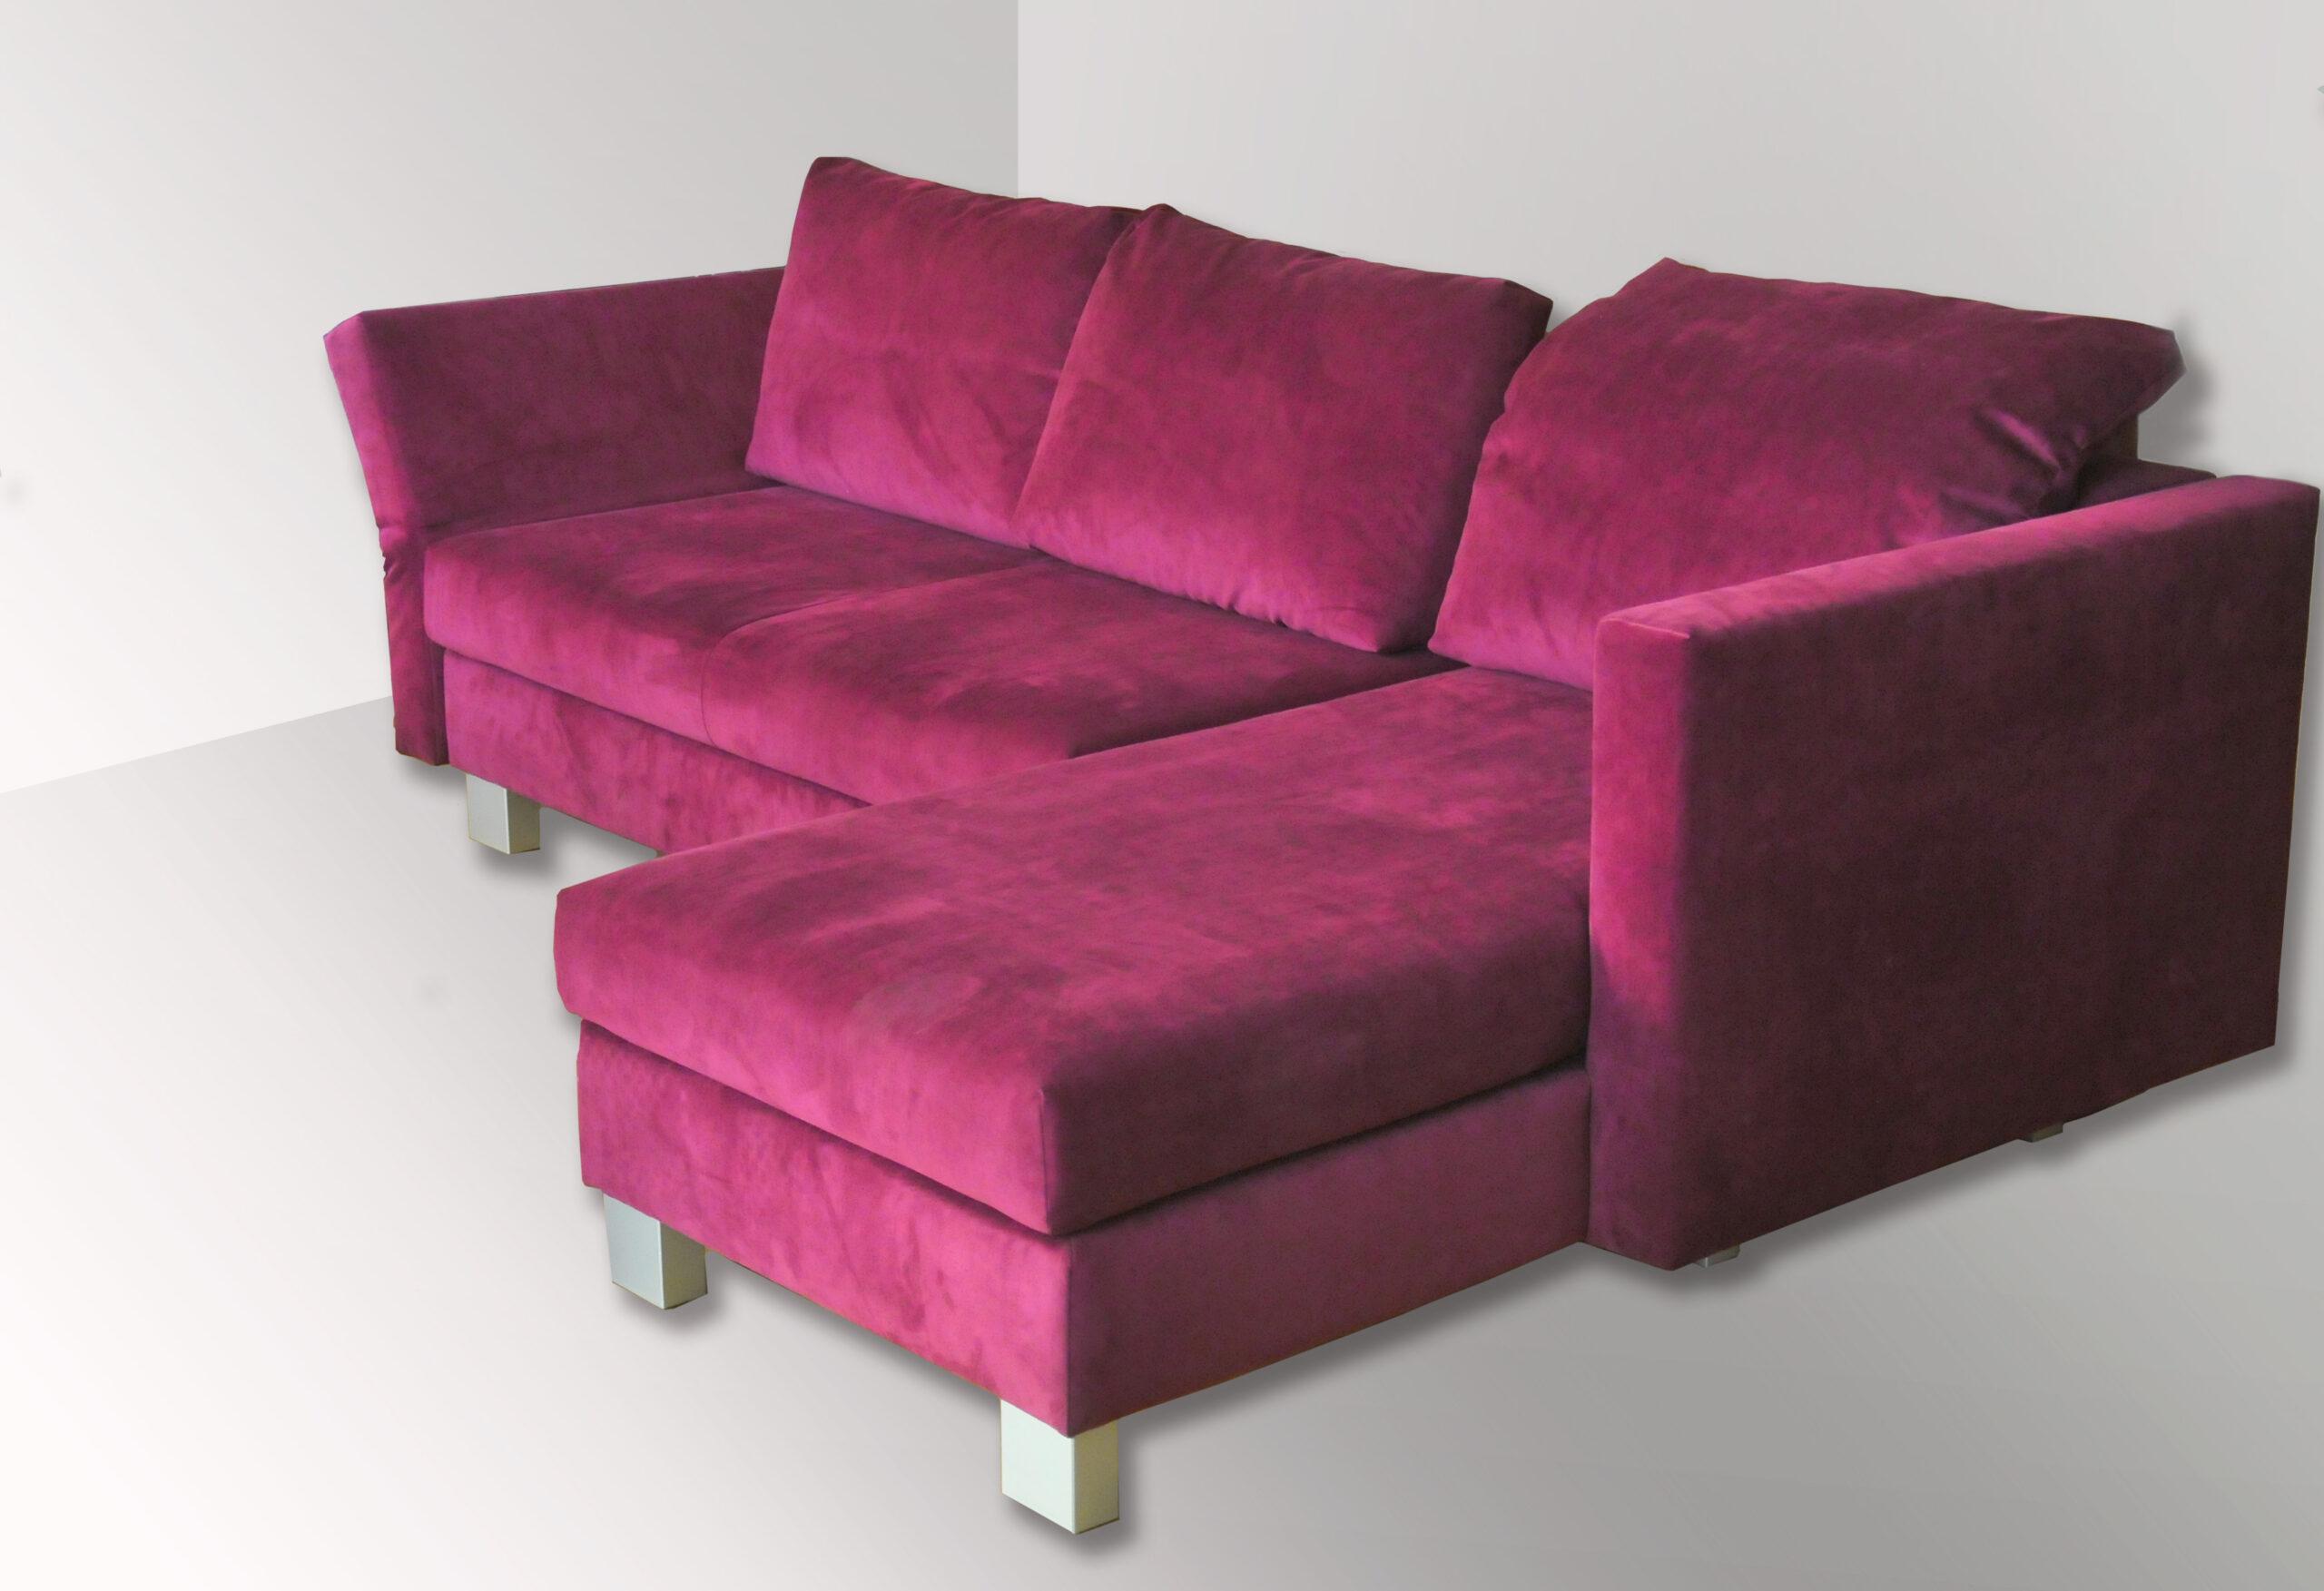 Full Size of Goodlife Sofa Furniture Amazon Signet Couch Good Life Malaysia Love Schlafsofas Gnstig Online Kaufen Barock De Sede Polster Reinigen Hersteller Kinderzimmer U Sofa Goodlife Sofa